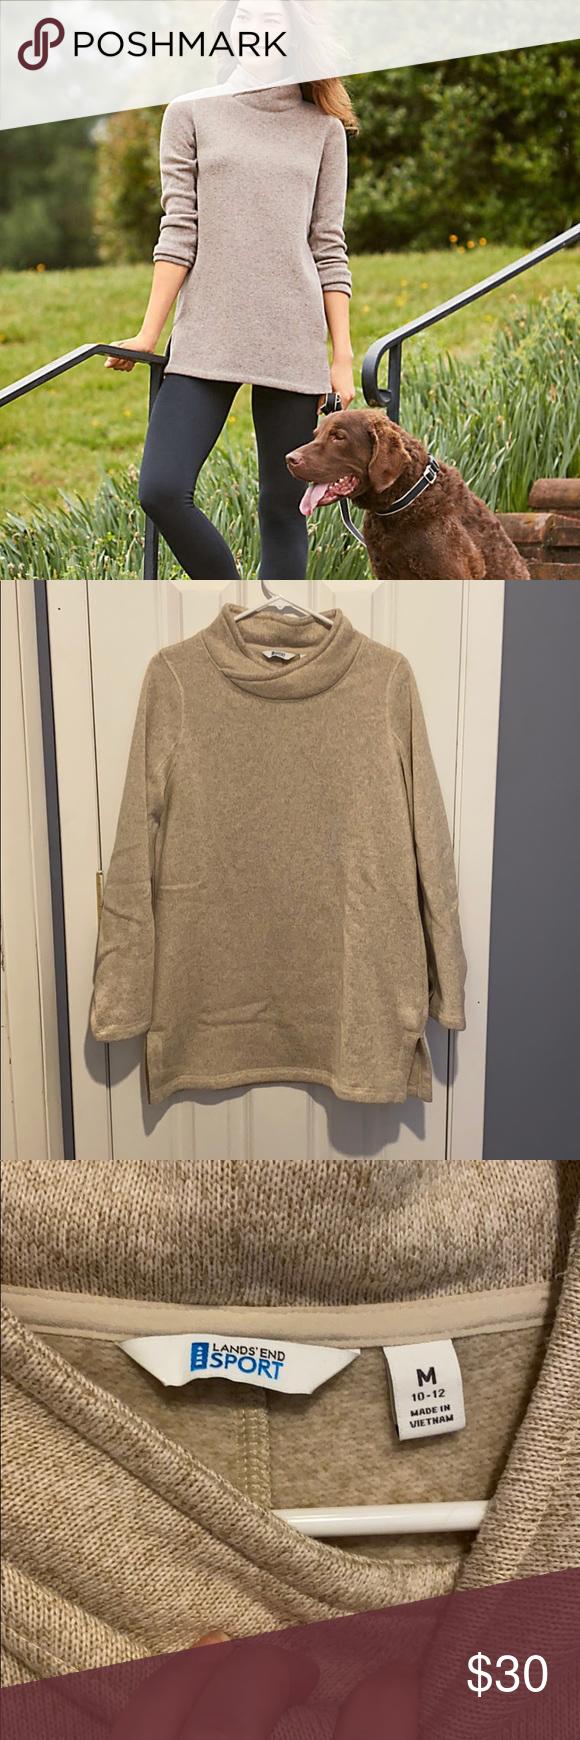 Lands End Euc Tunic Sport Fleece Sweater Fleece Sweater Tunic Sweater Sweatshirt Tops [ 1740 x 580 Pixel ]